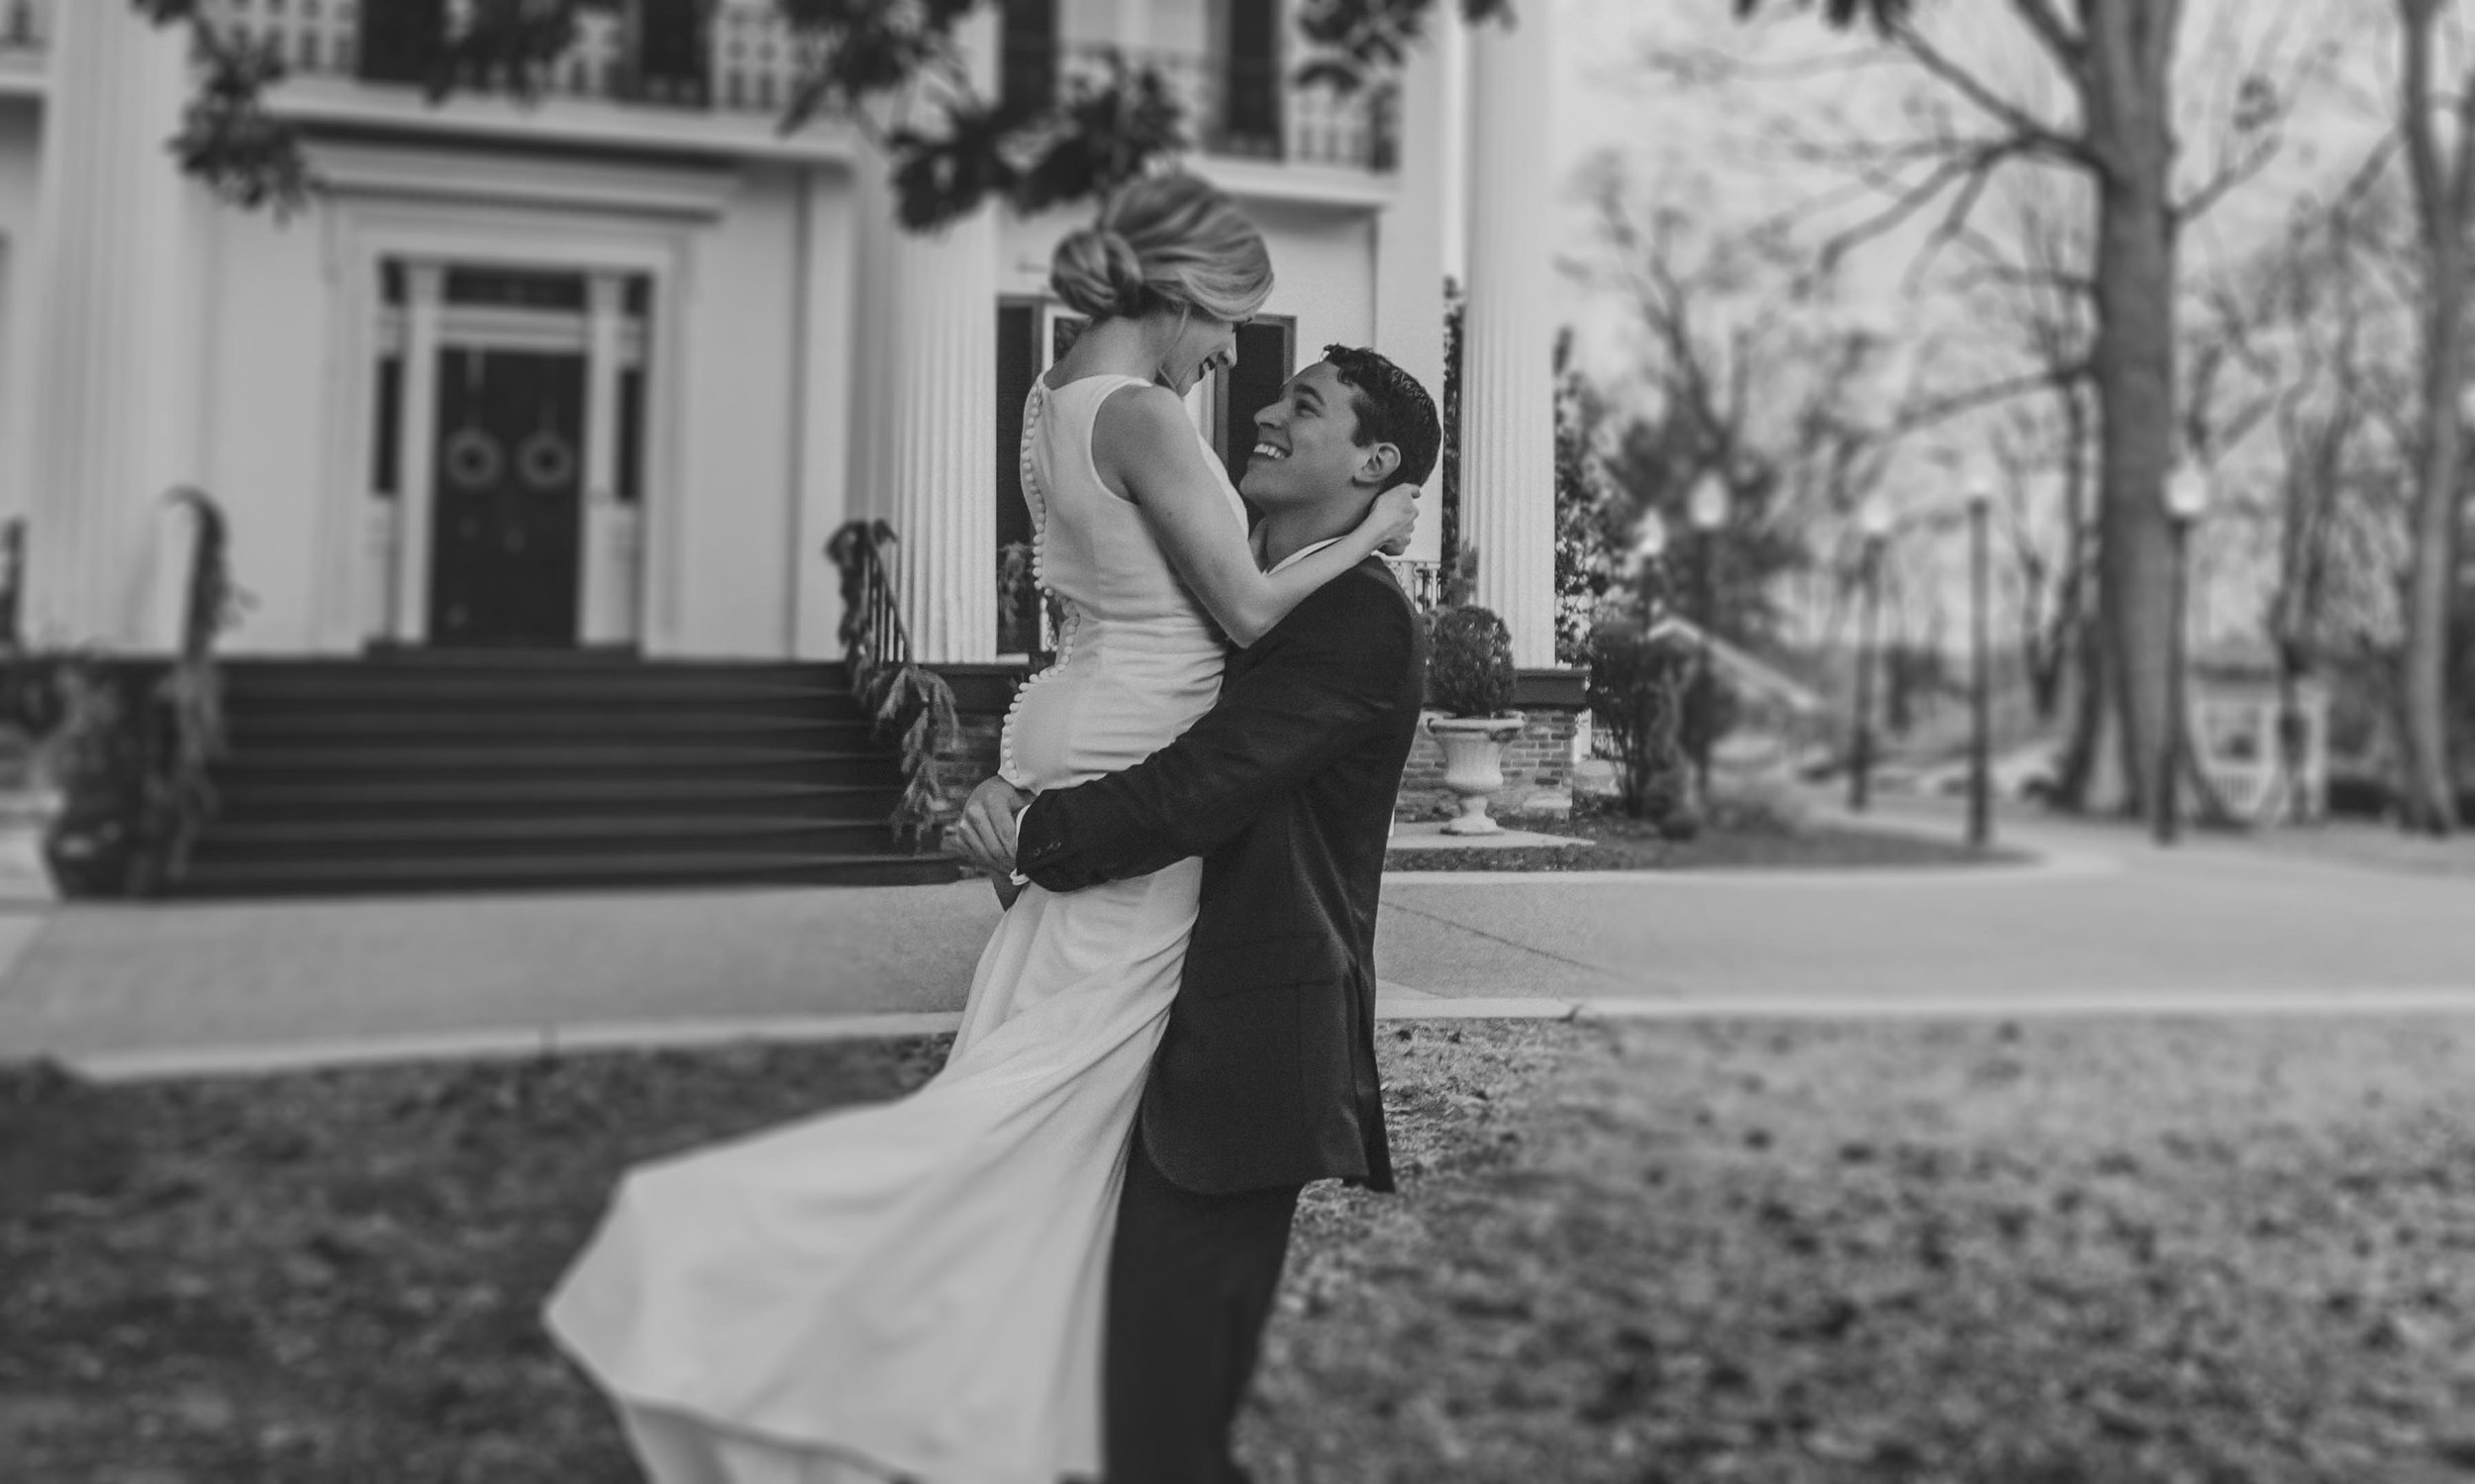 Charis_Lauren_Romantic_Wedding_Photographer_Nashville_01159.jpg